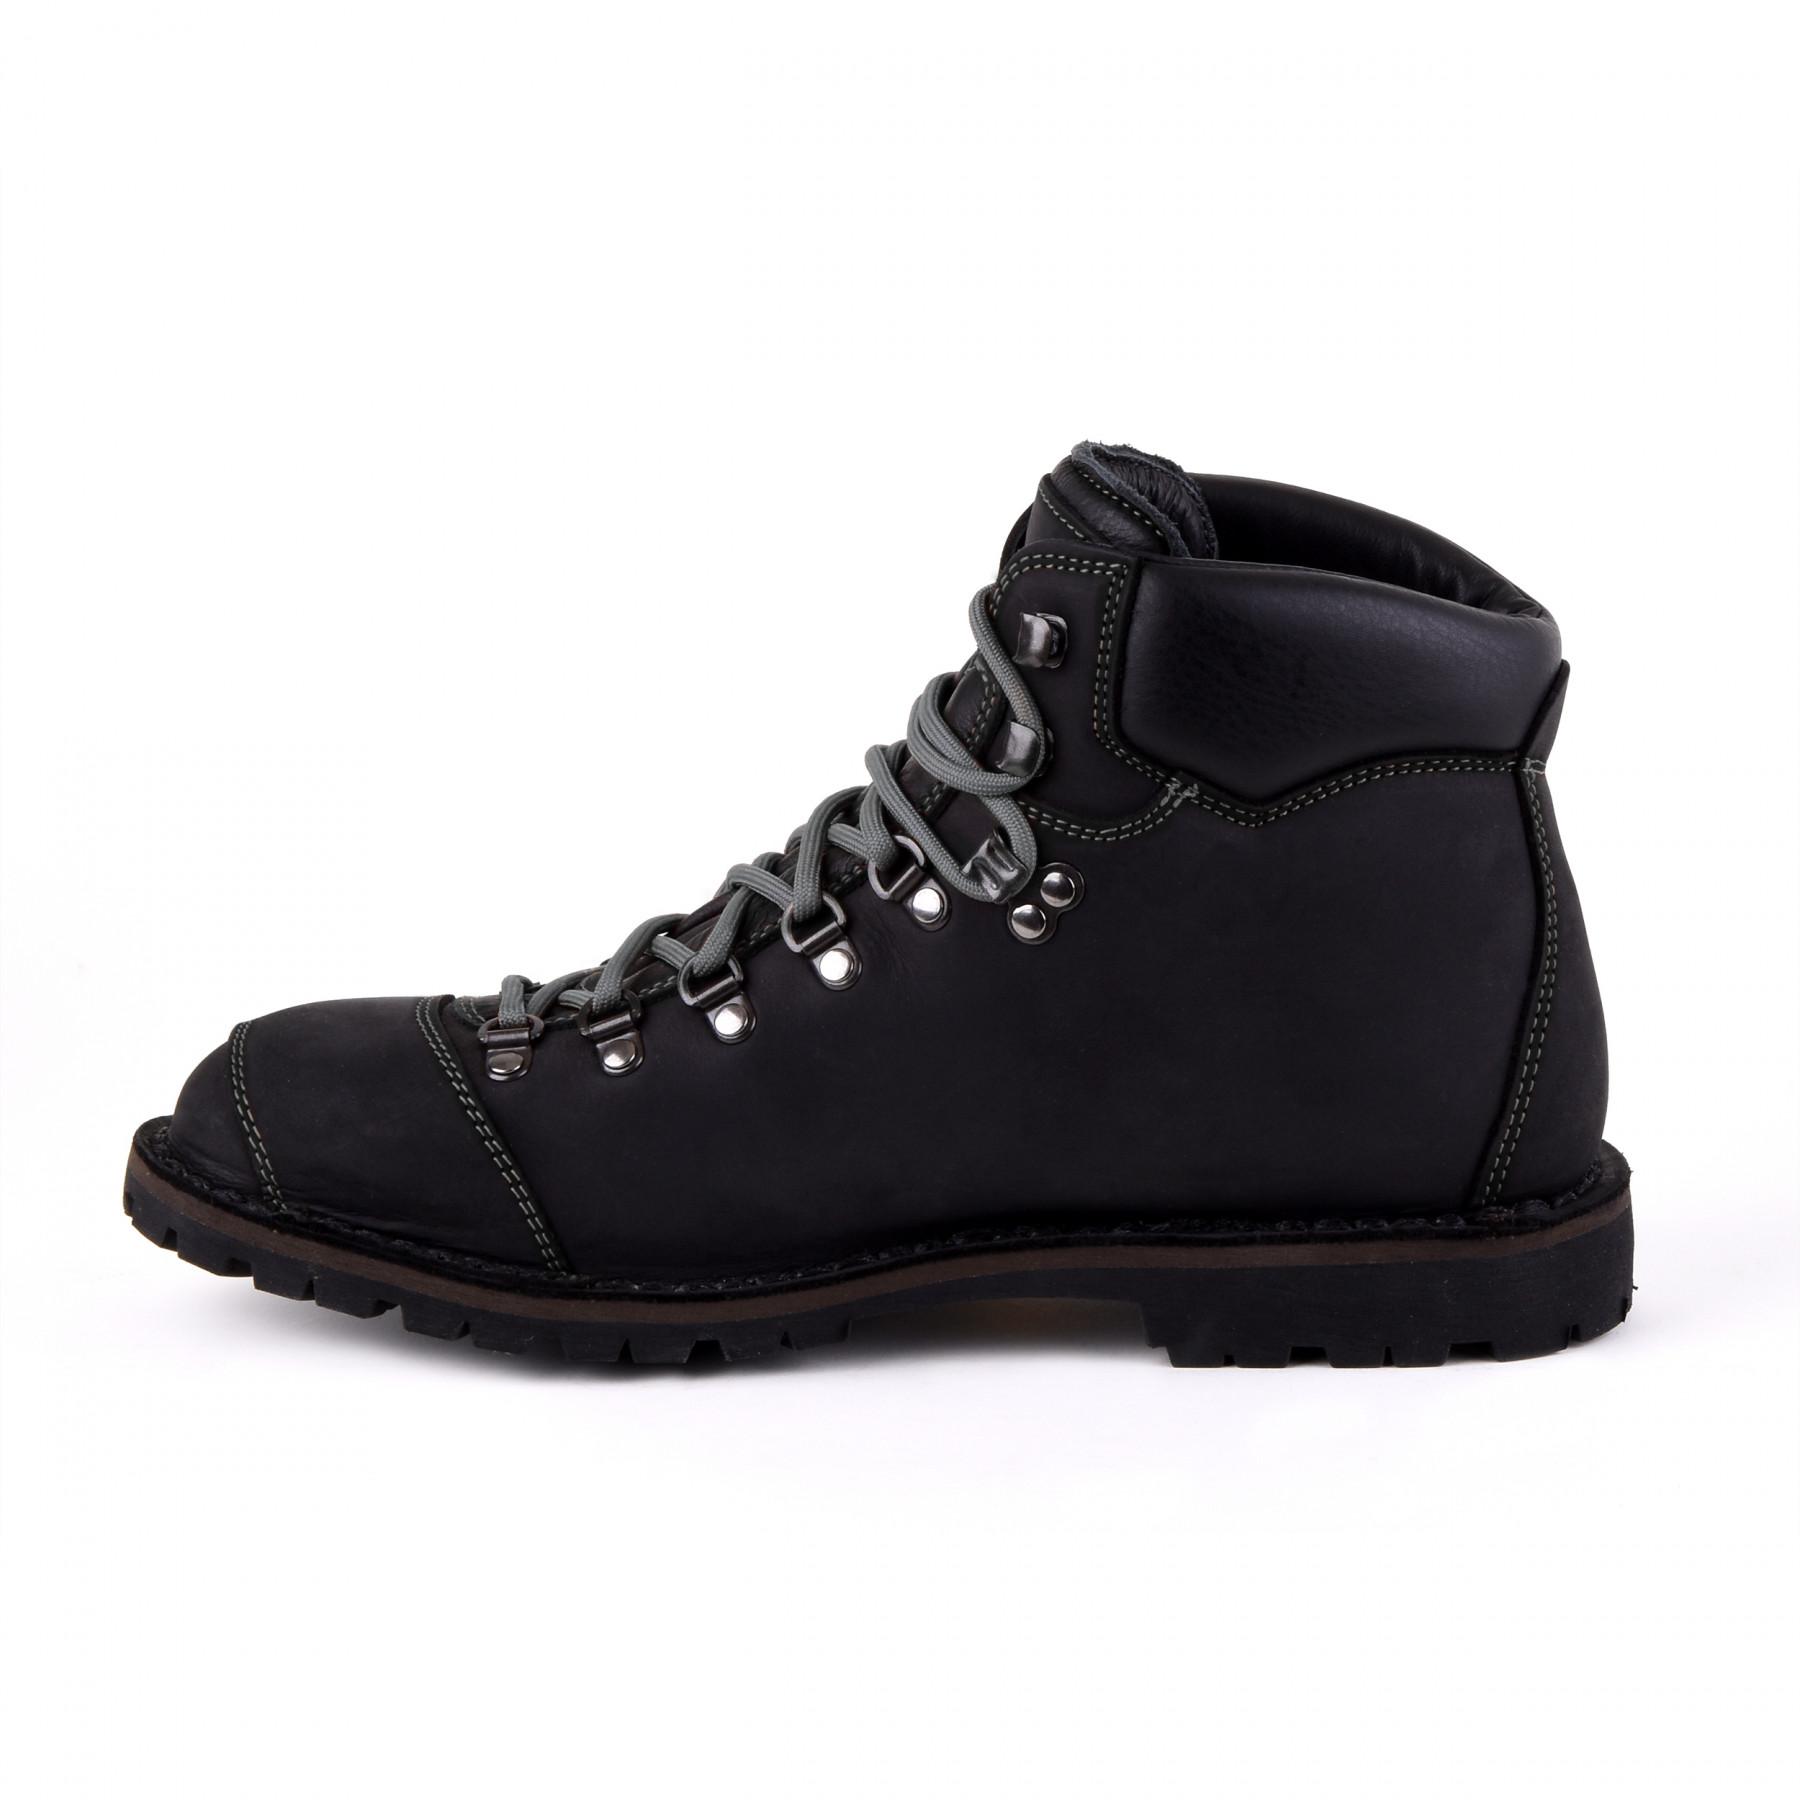 Biker Boot Adventure Denver Black, schwarze Damen Stiefel, graue Nähte